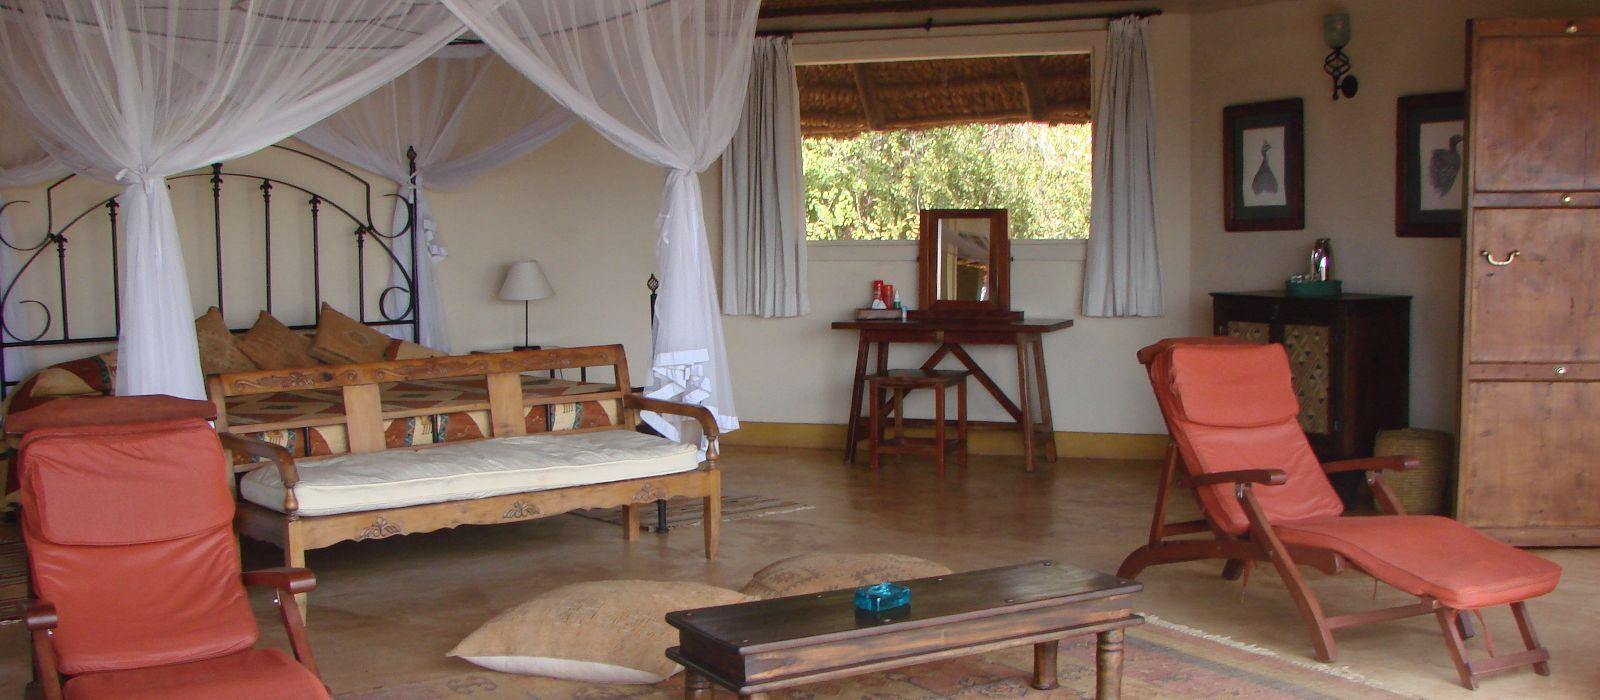 Hotel Elsas Kopje Kenya